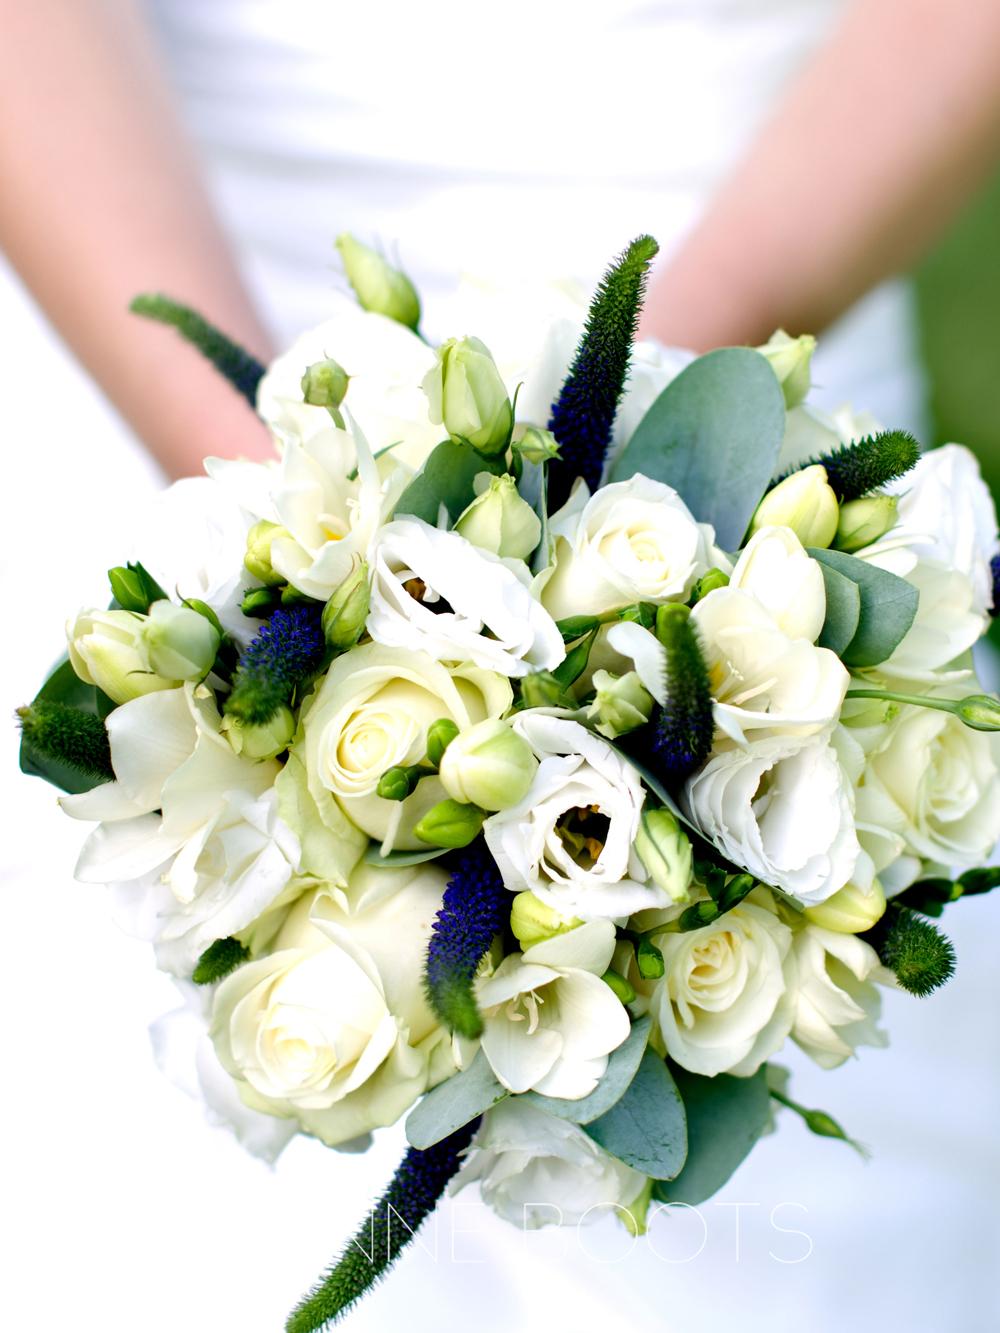 Bruidsboeket | Rozen, Lisianthus, Freesia's en Veronica